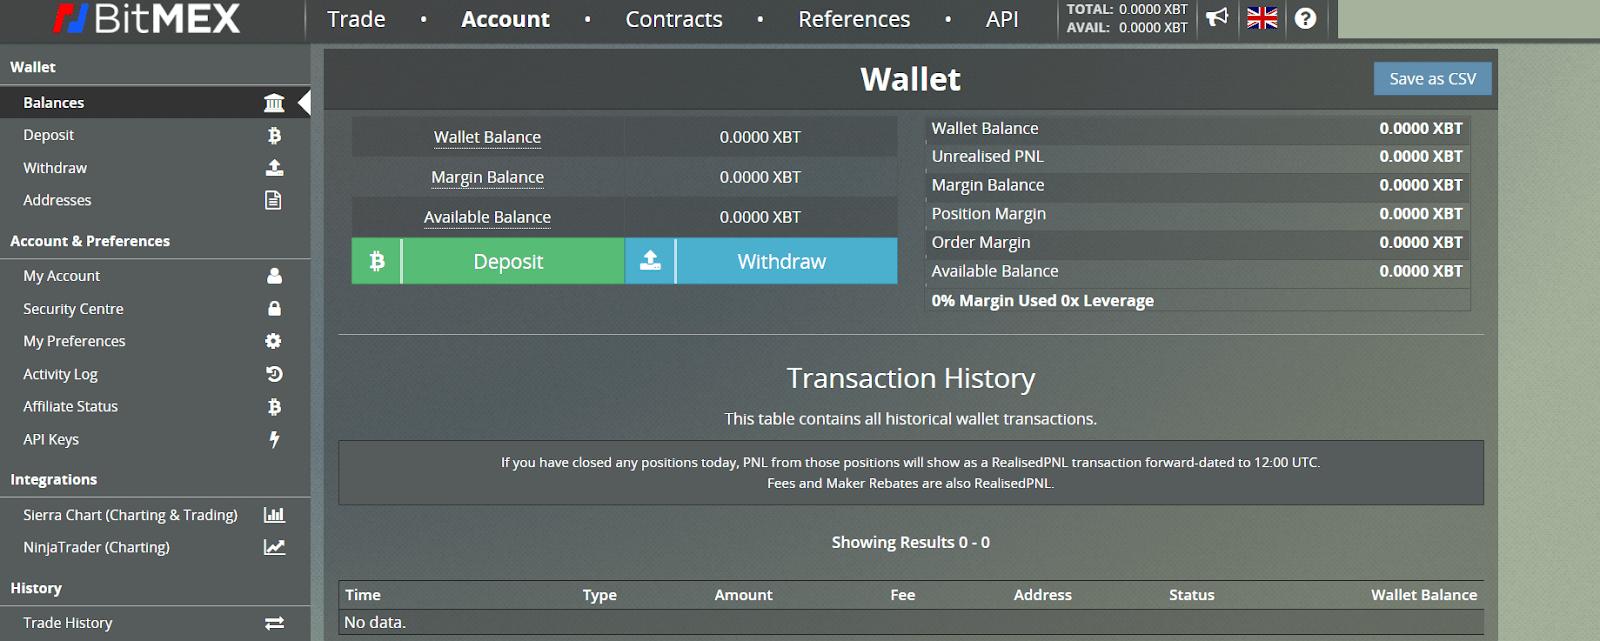 BitMEX deposit